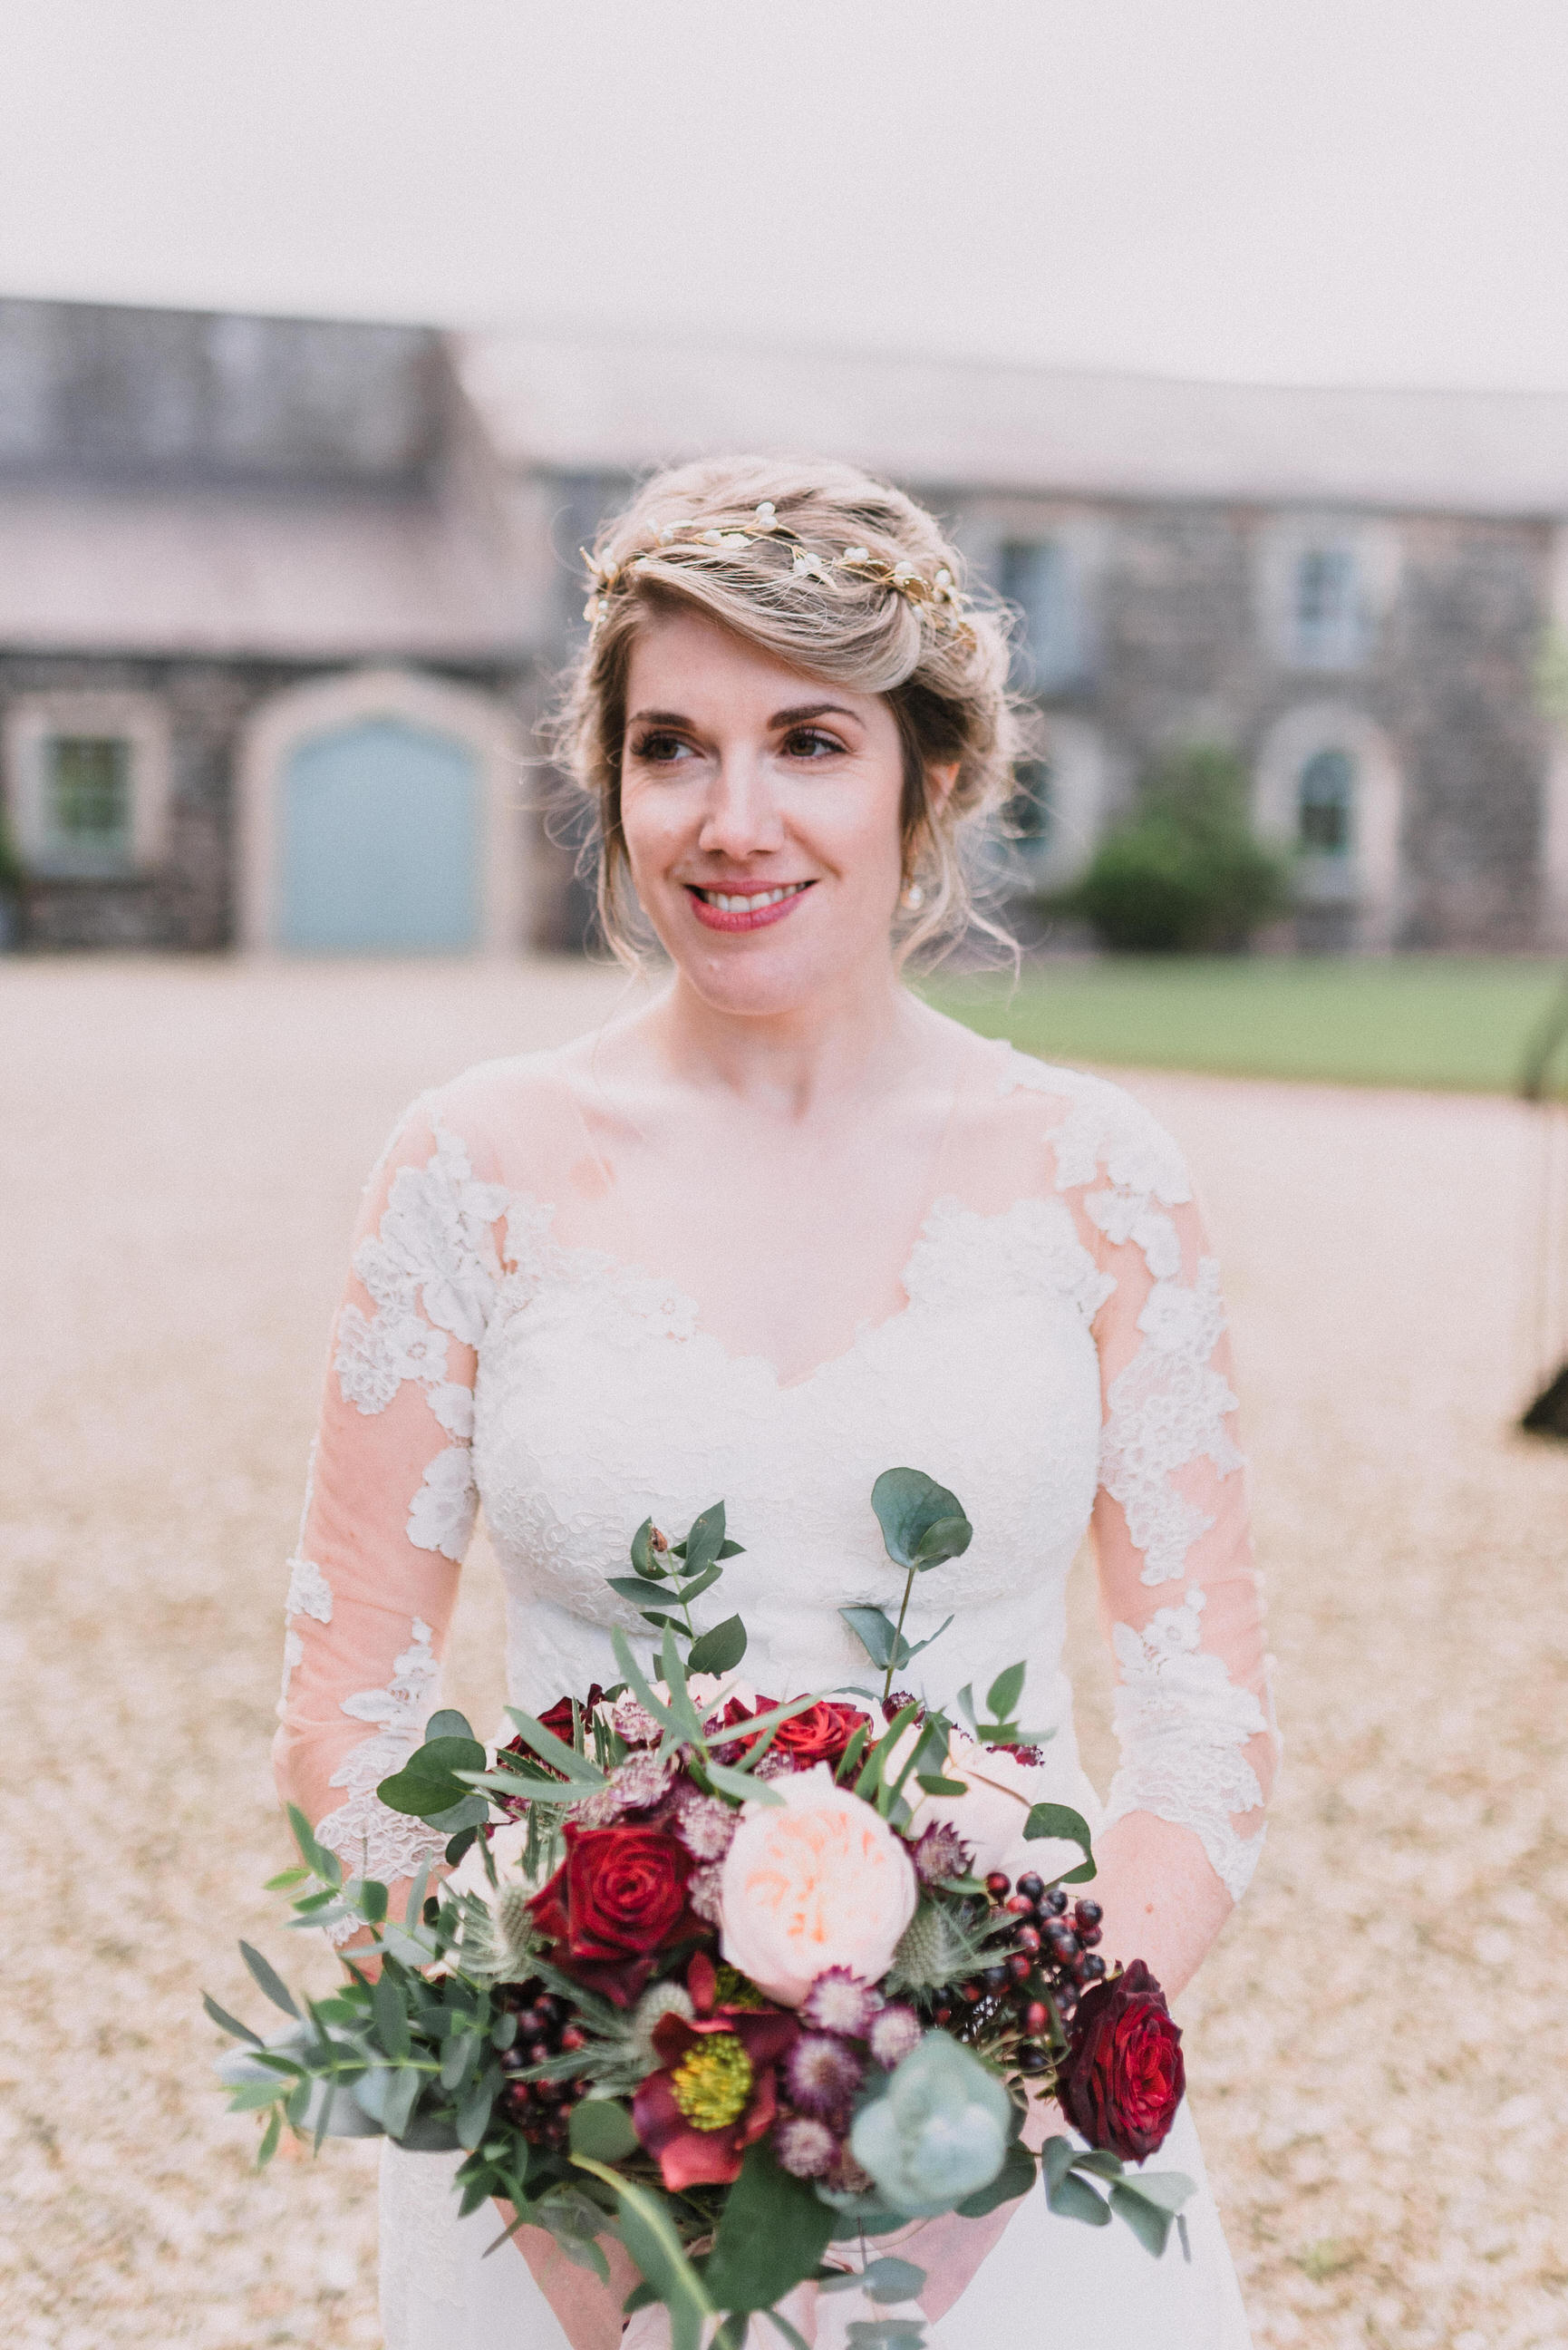 lissanoure castle wedding, northern ireland wedding photographer, romantic northern irish wedding venue, castle wedding ireland, natural wedding photography ni (91).jpg